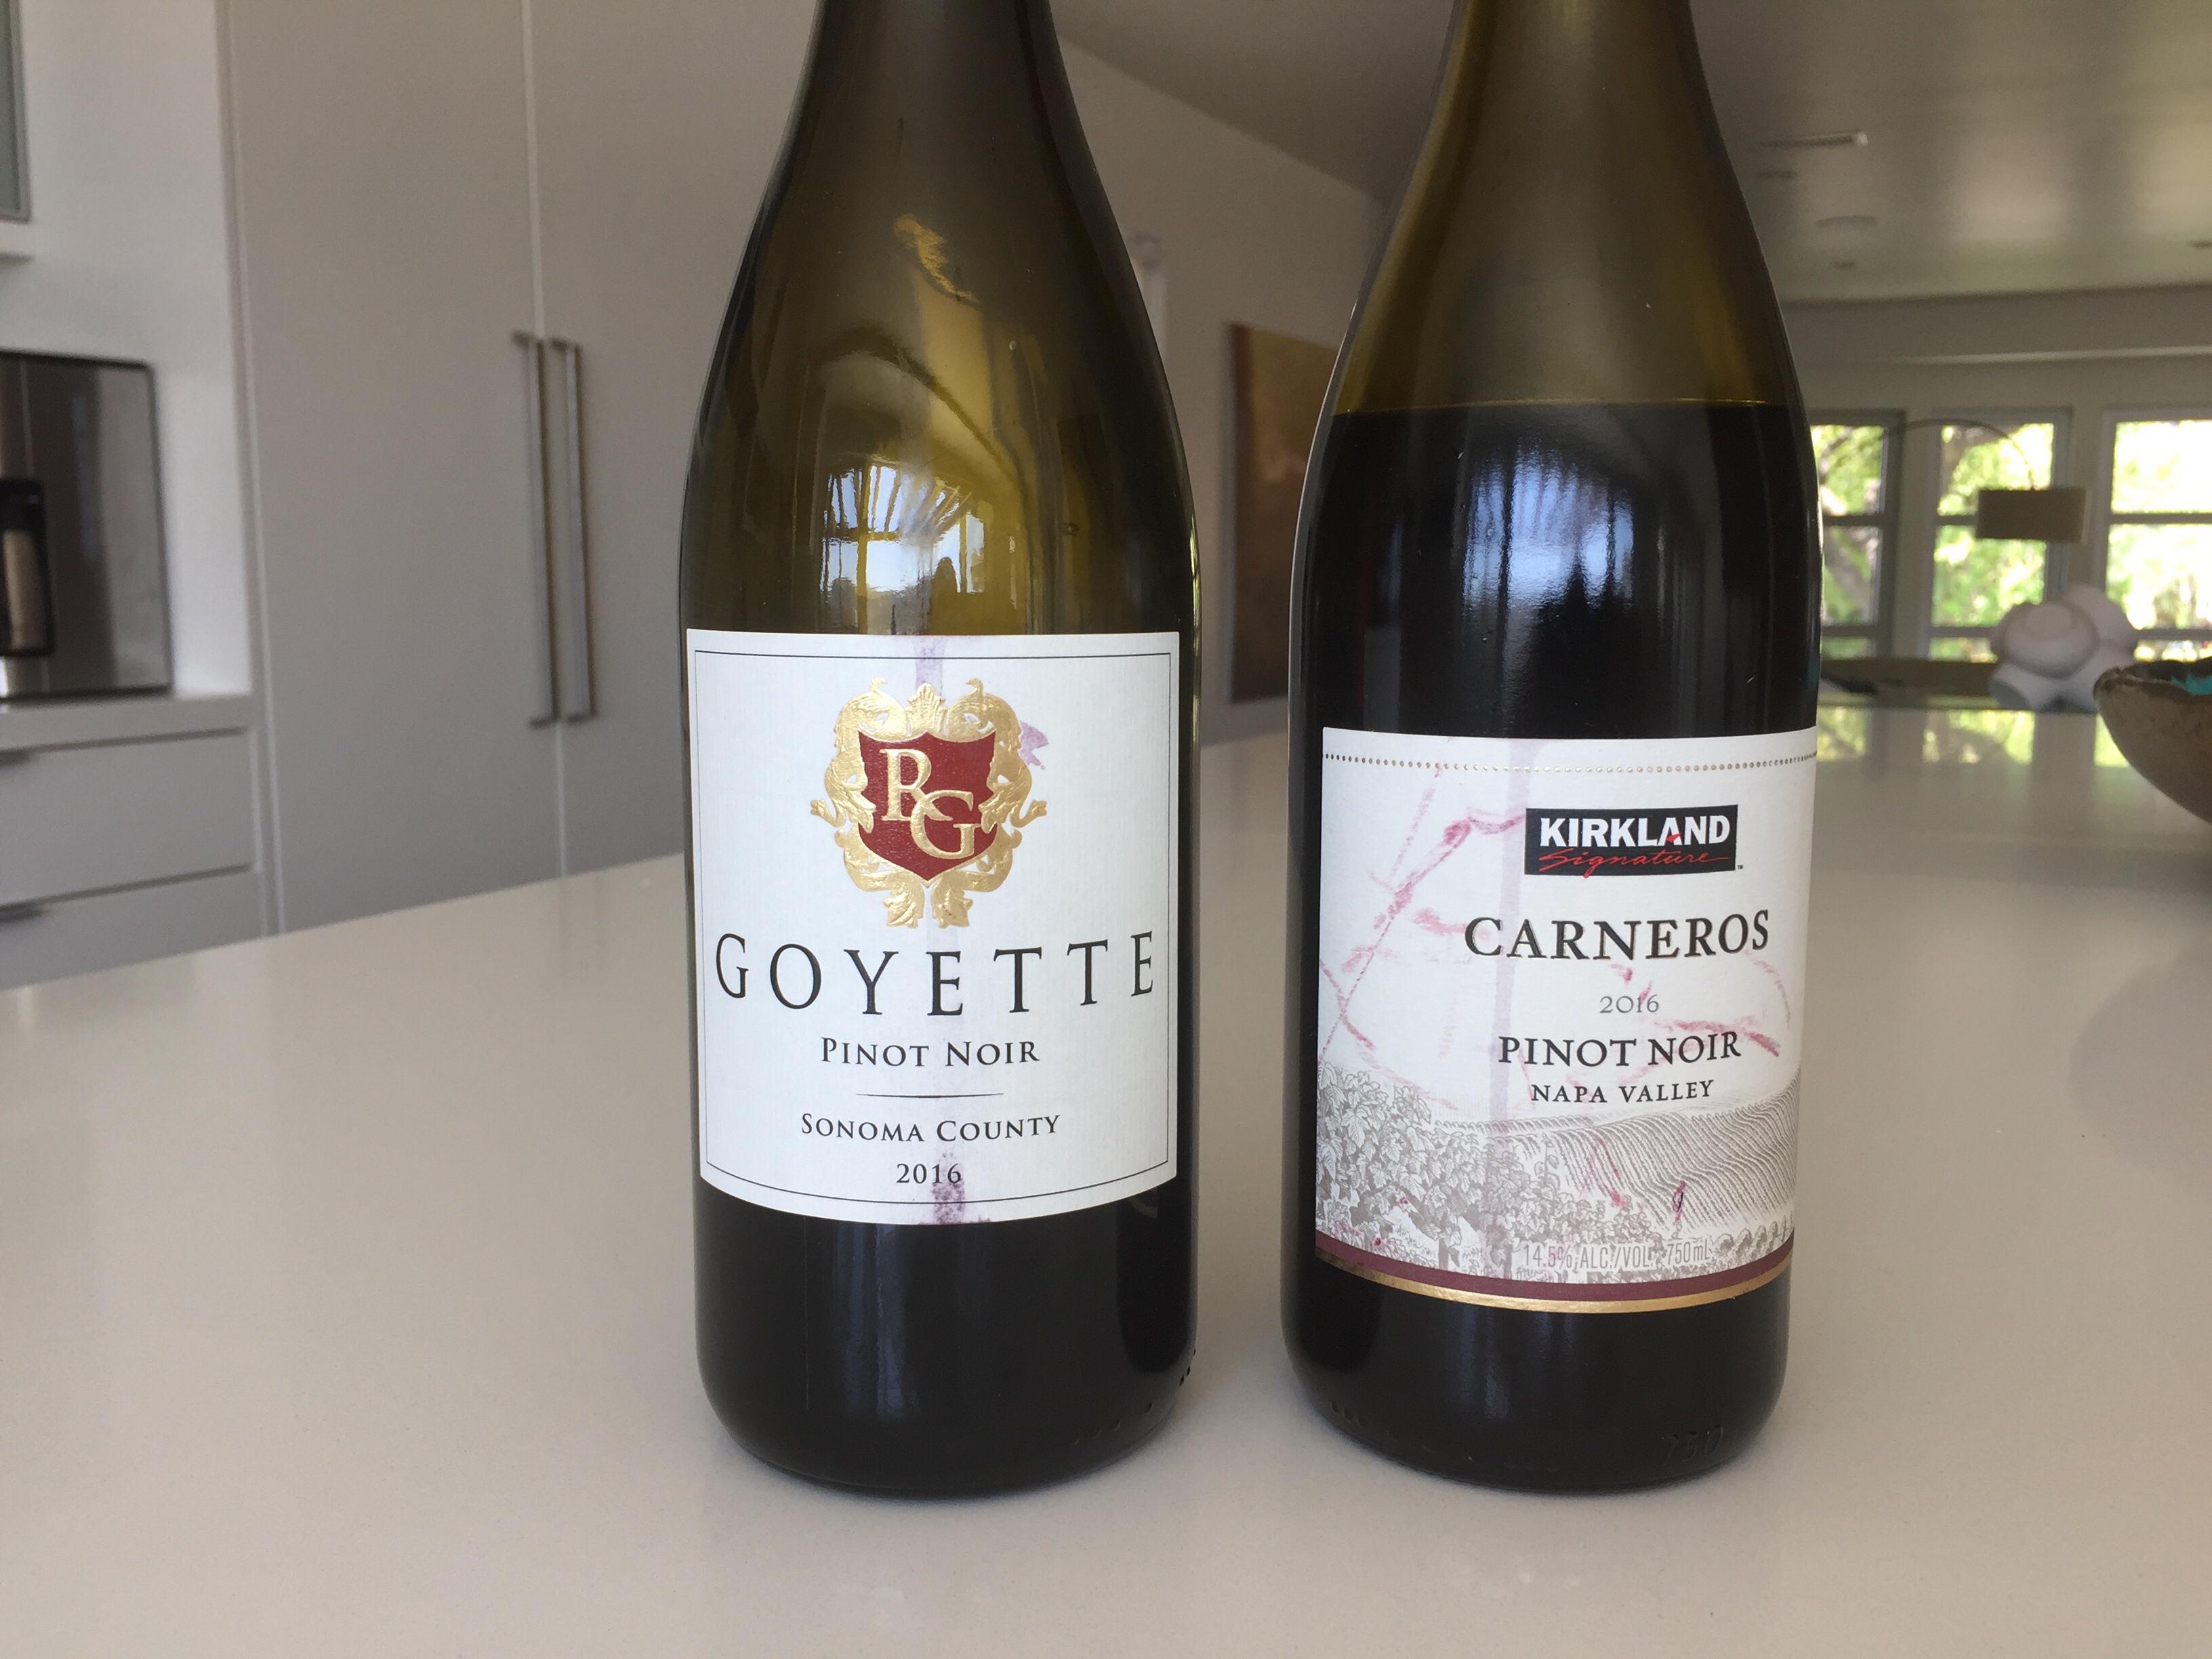 2016 Goyette Sonoma County Pinot Noir & 2016 Goyette Sonoma County Pinot Noir